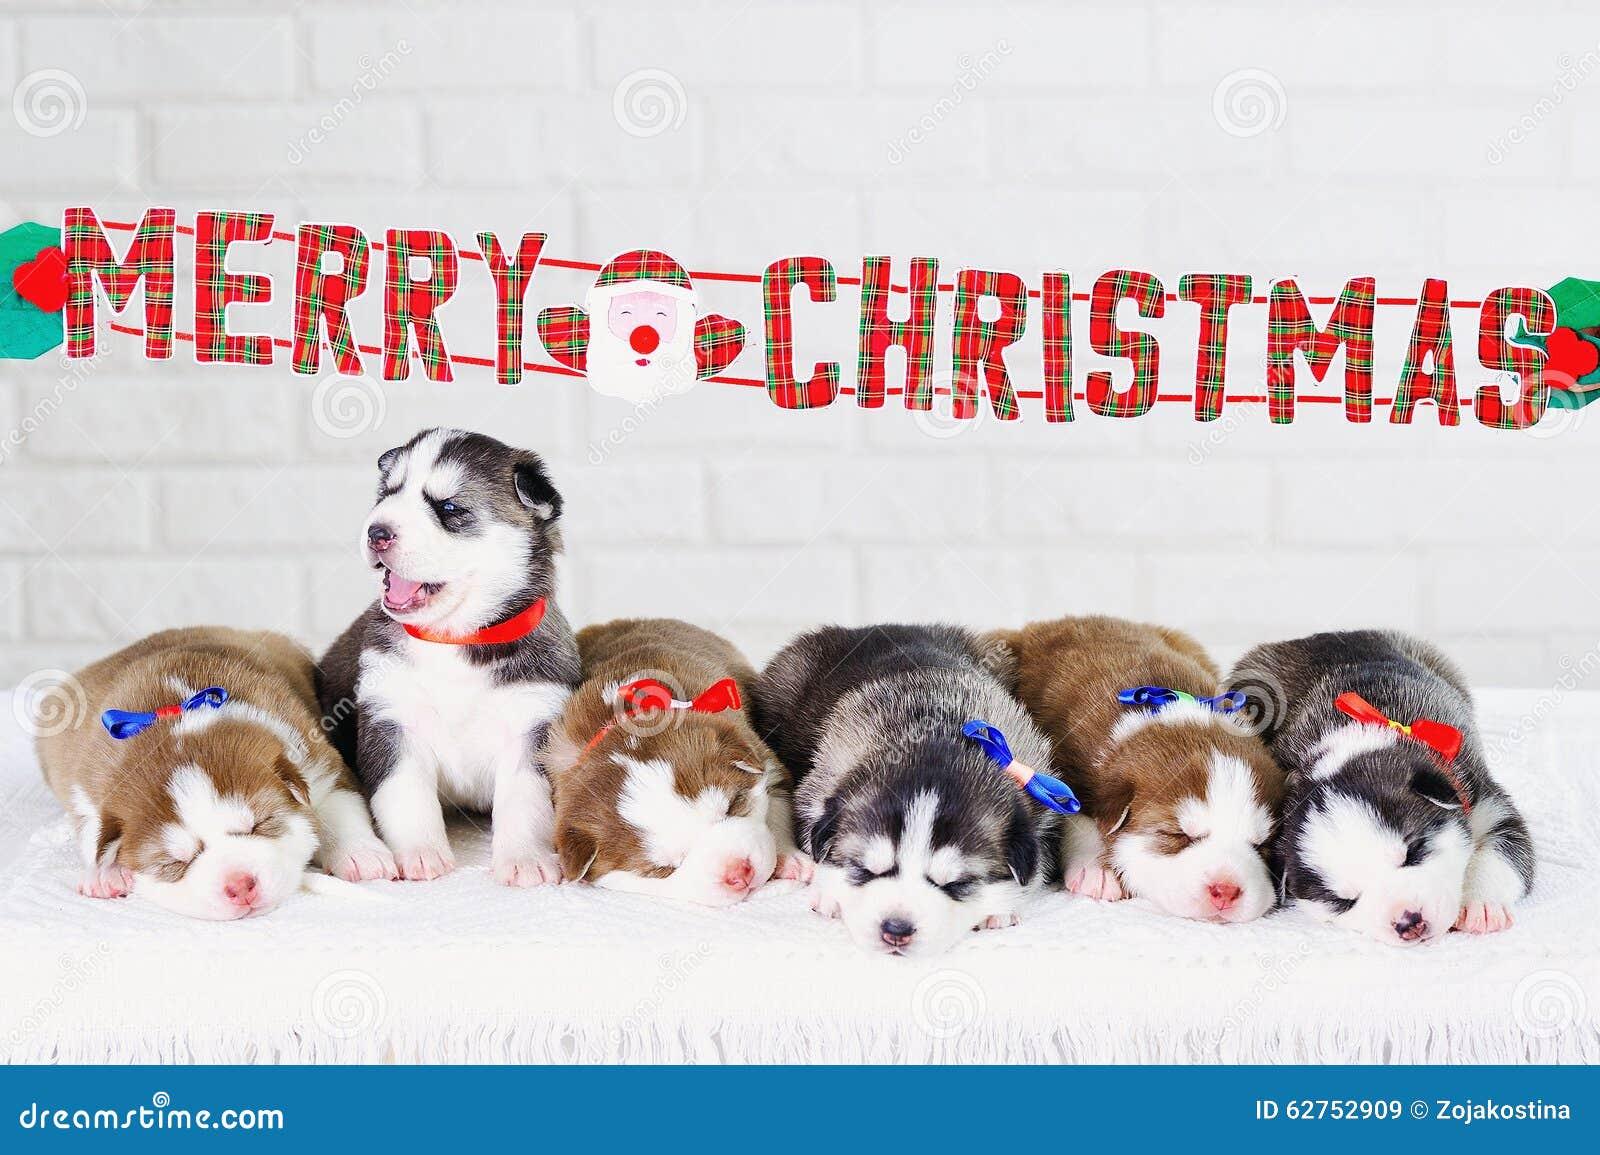 Husky Christmas Puppy.Siberian Husky Puppies Christmas Present Stock Image Image